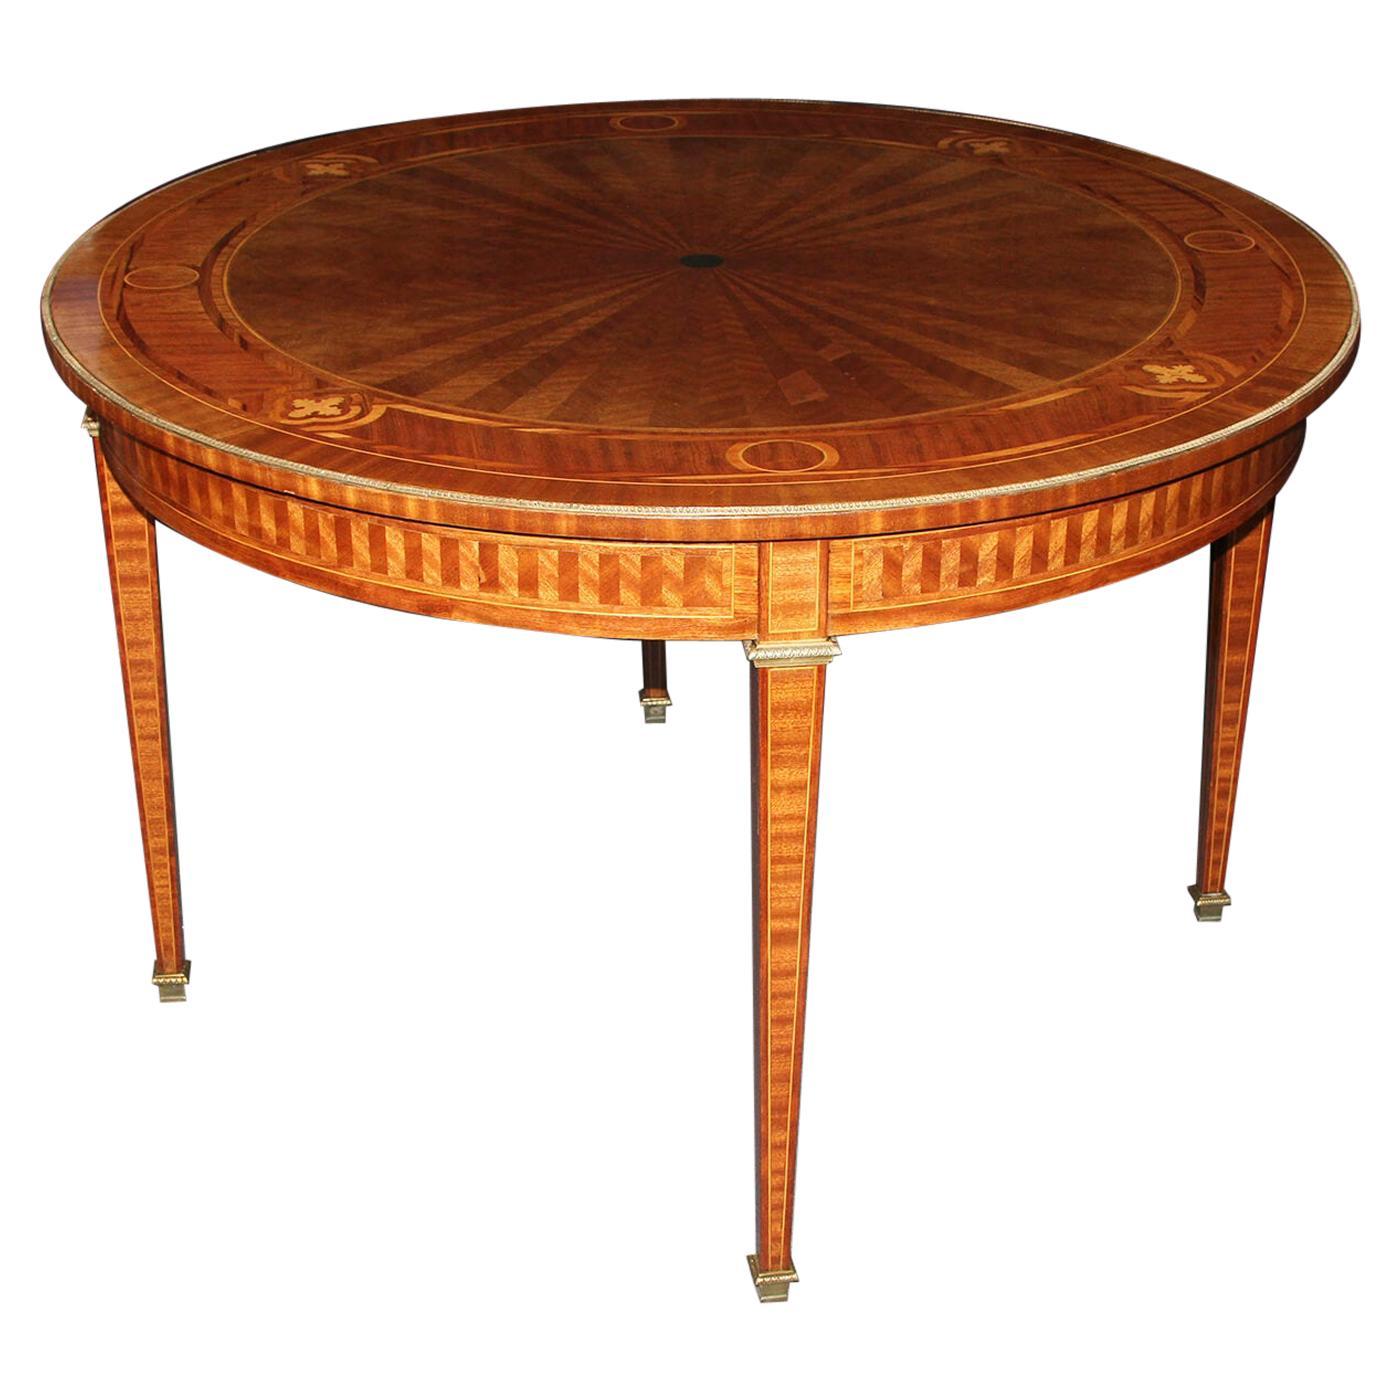 Louis XVI Parquetry Center Table